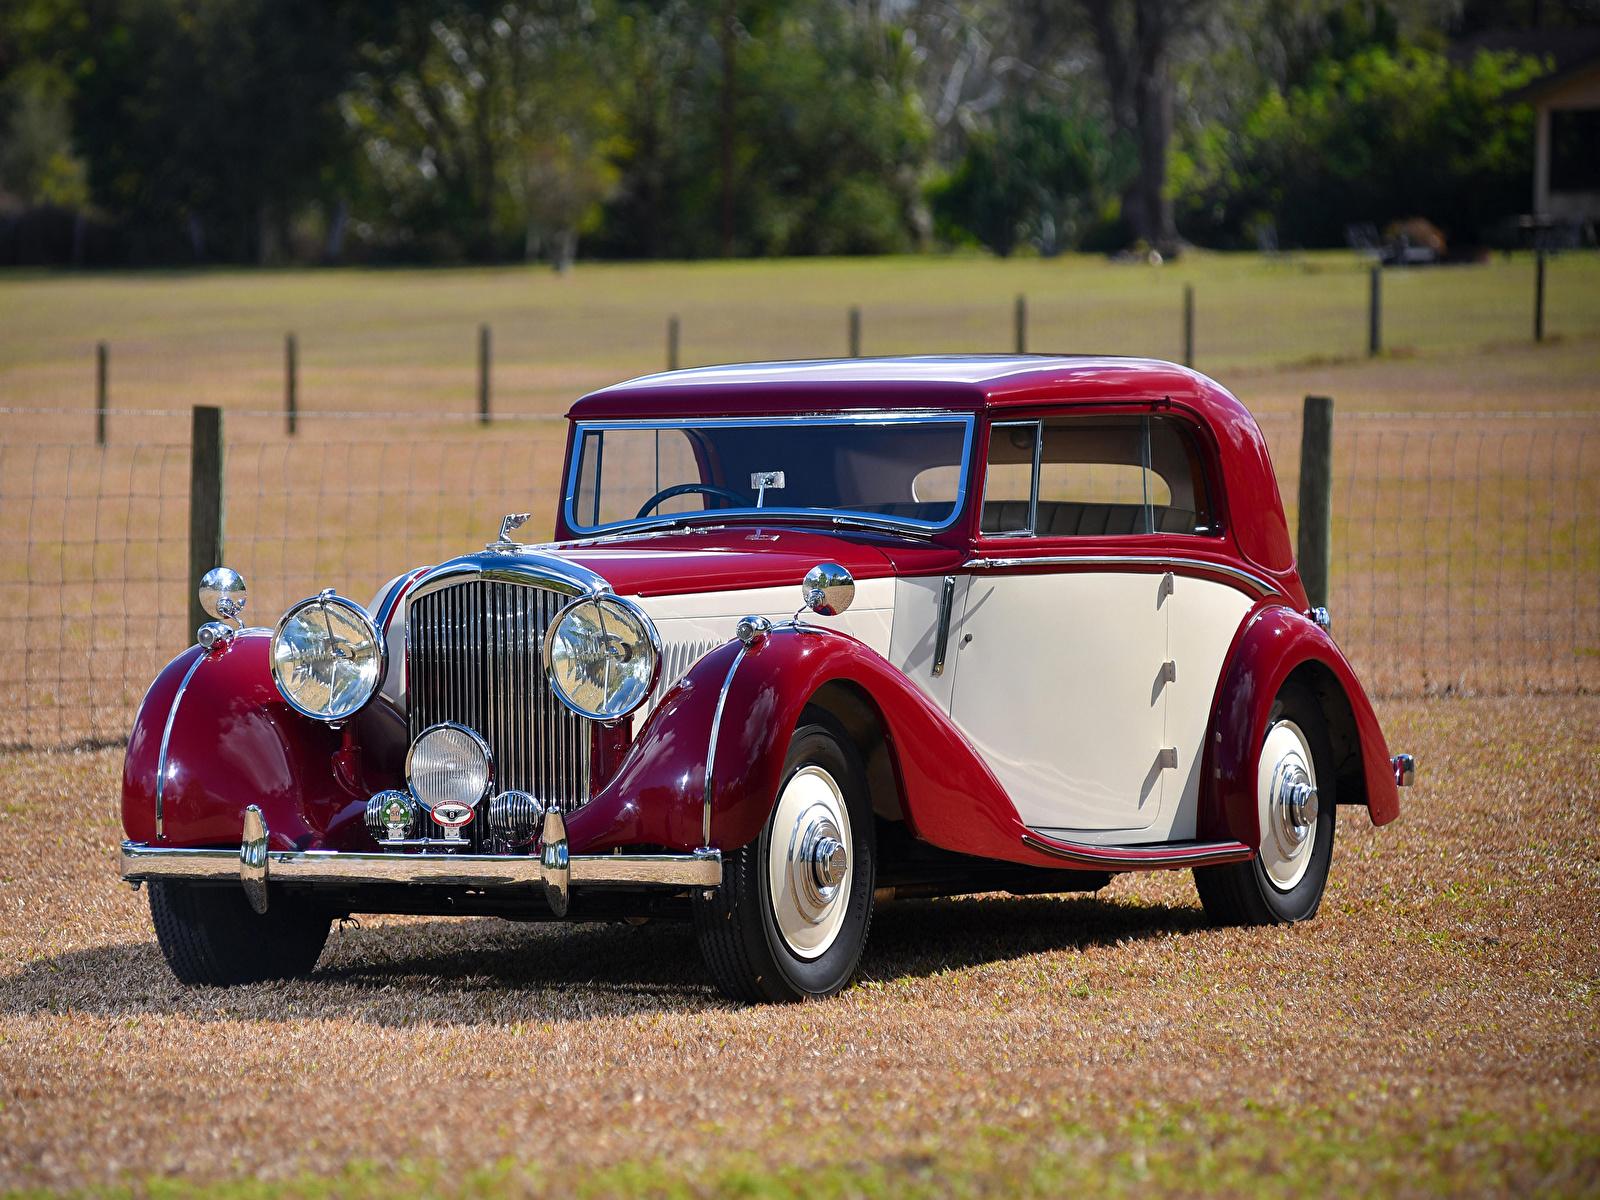 Картинка Бентли 1939 4 ¼ Litre Coupe by Park Ward винтаж Металлик Автомобили 1600x1200 Bentley Ретро старинные авто машины машина автомобиль